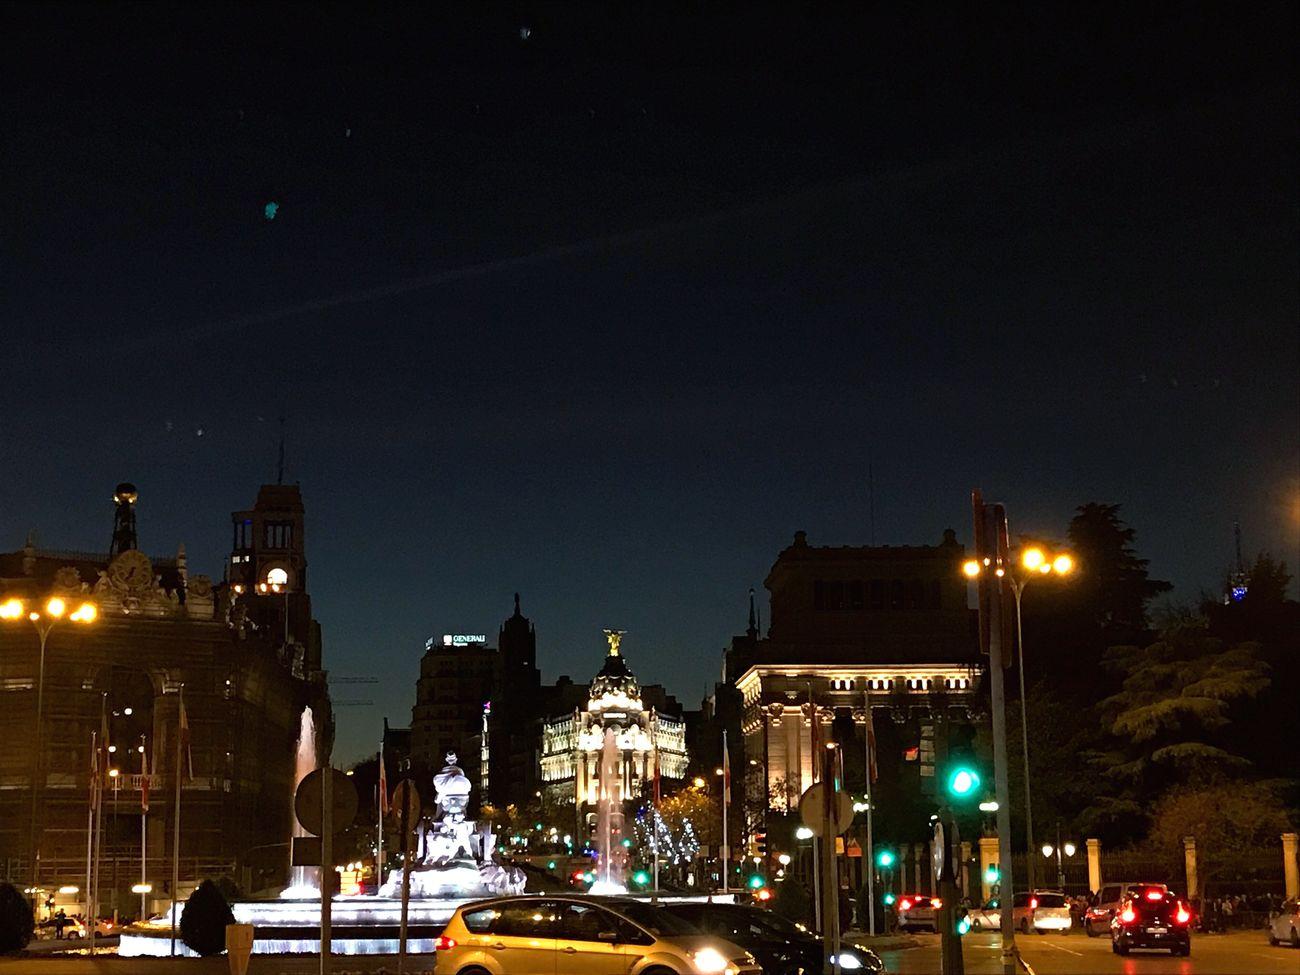 Cibeles Ayuntamiento De Madrid. Illuminated Sky Horaazul Architecture Outdoors City